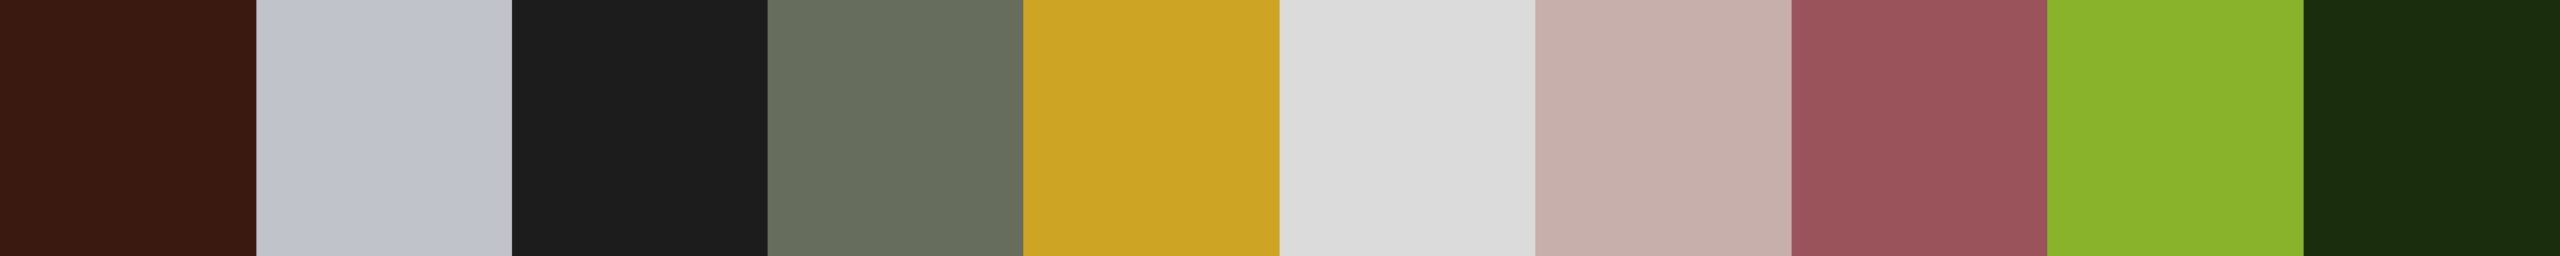 138 Somineta Color Palette